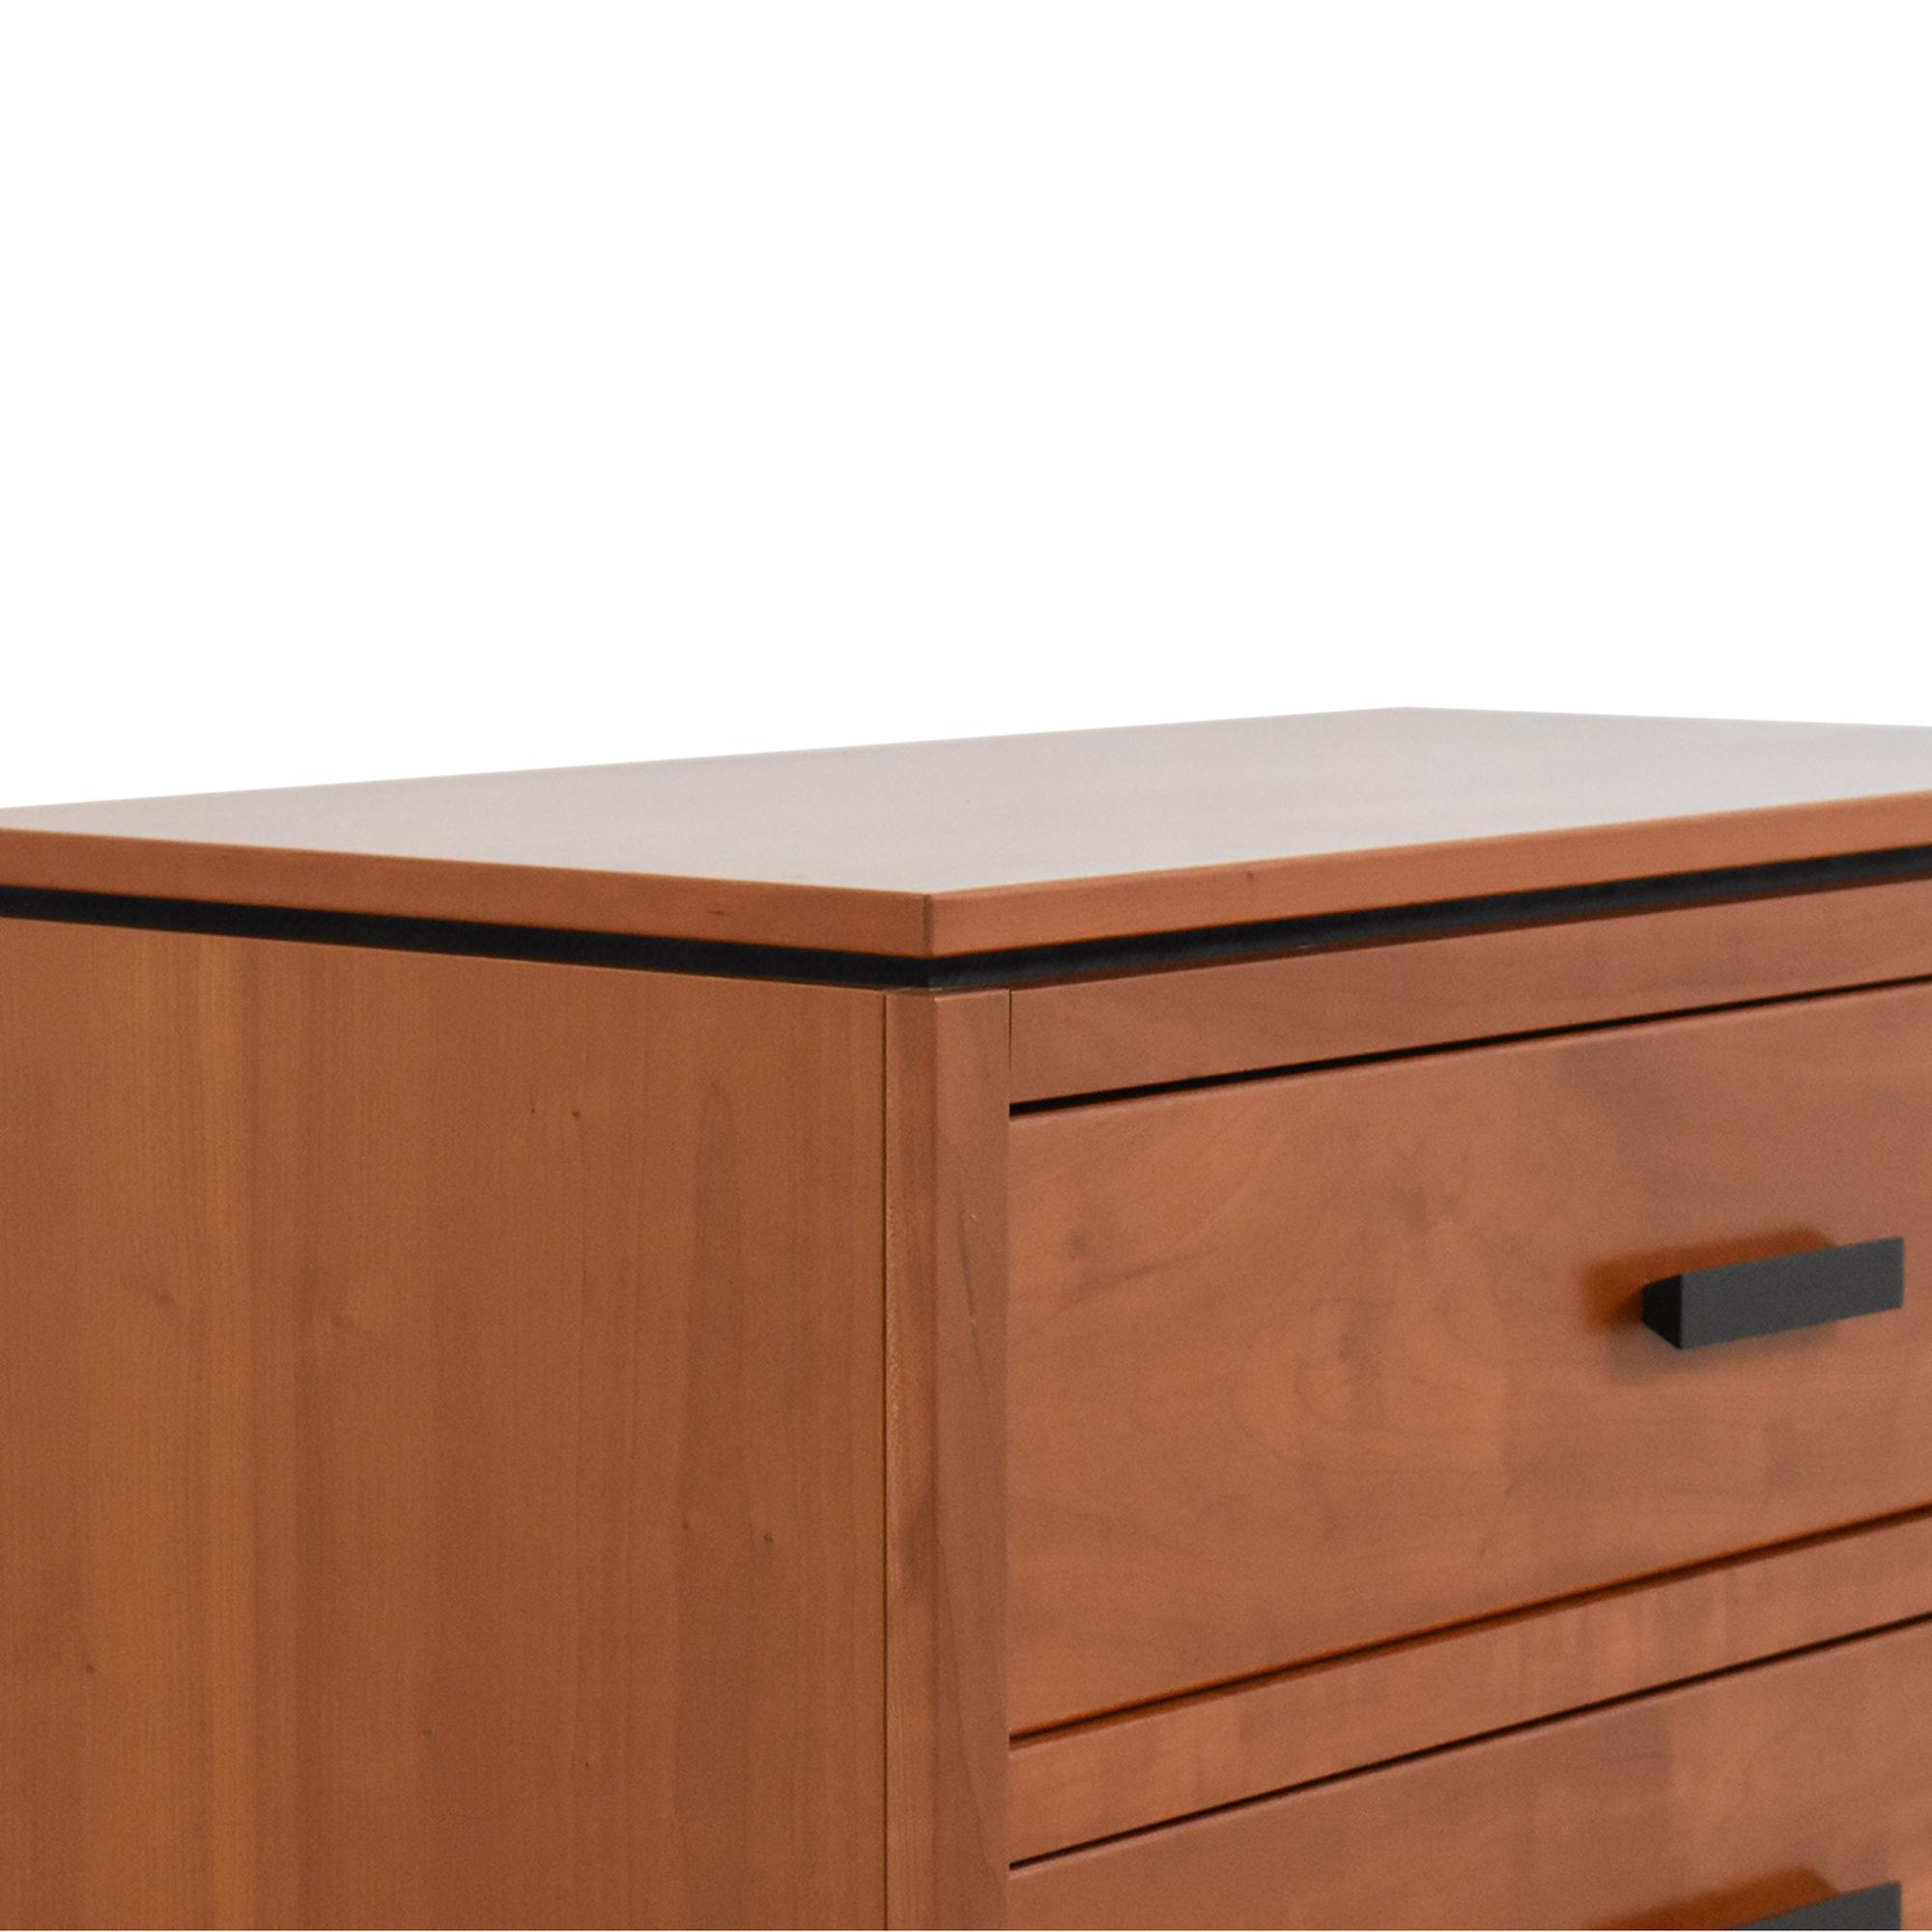 Workbench Workbench Five Drawer Chest on sale